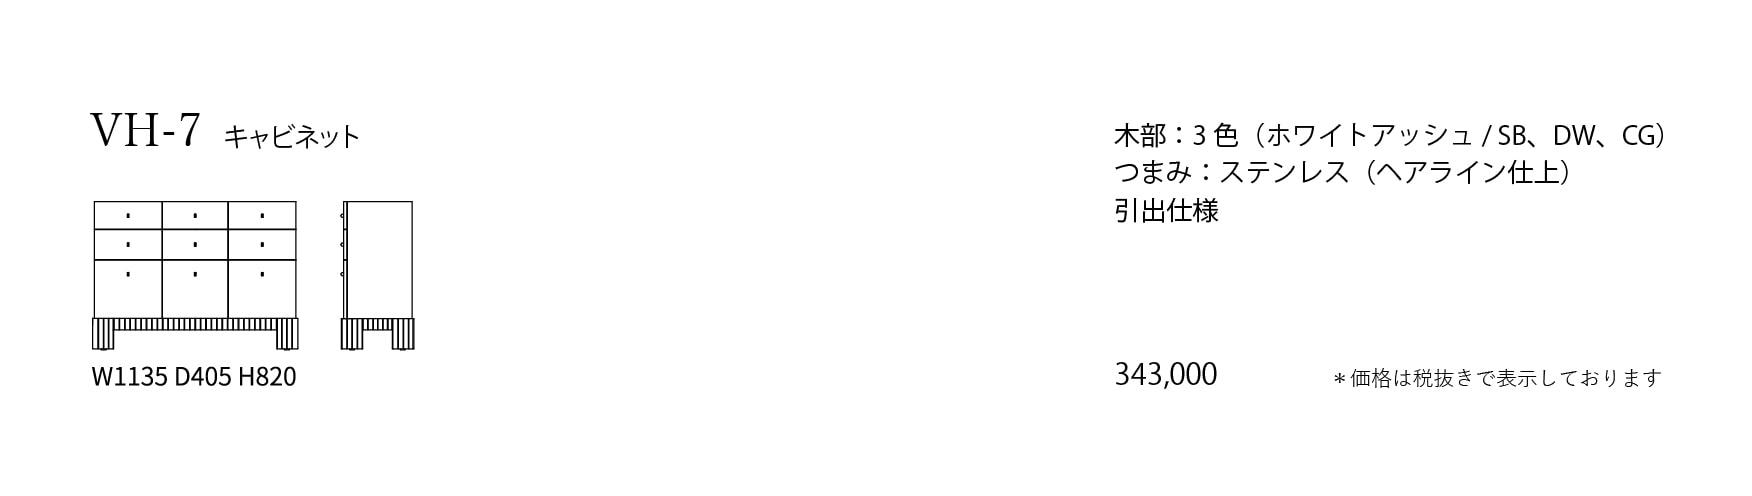 VH-7 Price List